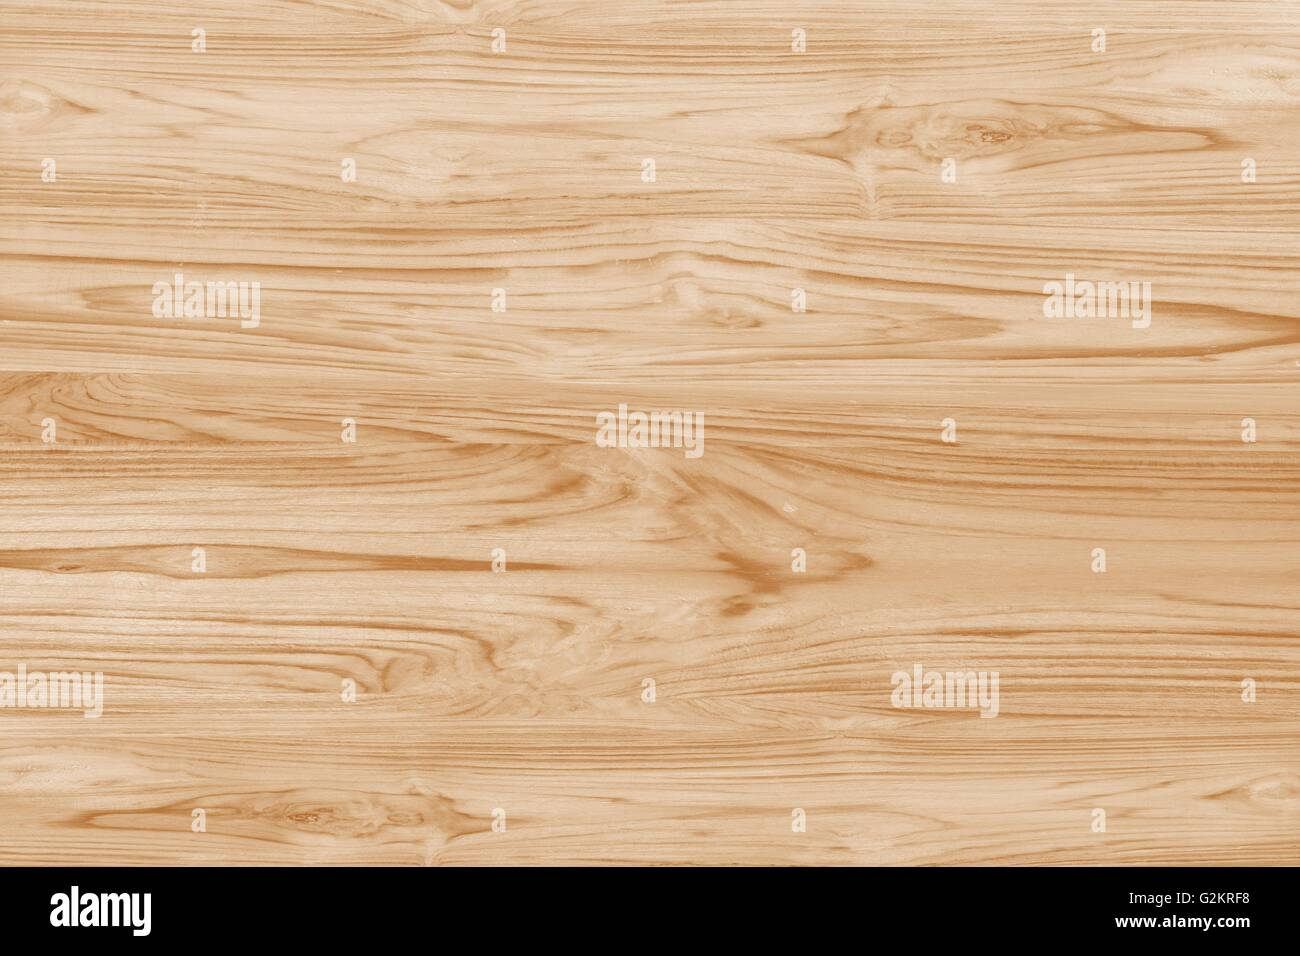 Strip Wood Floor Stock Photos & Strip Wood Floor Stock Images - Alamy